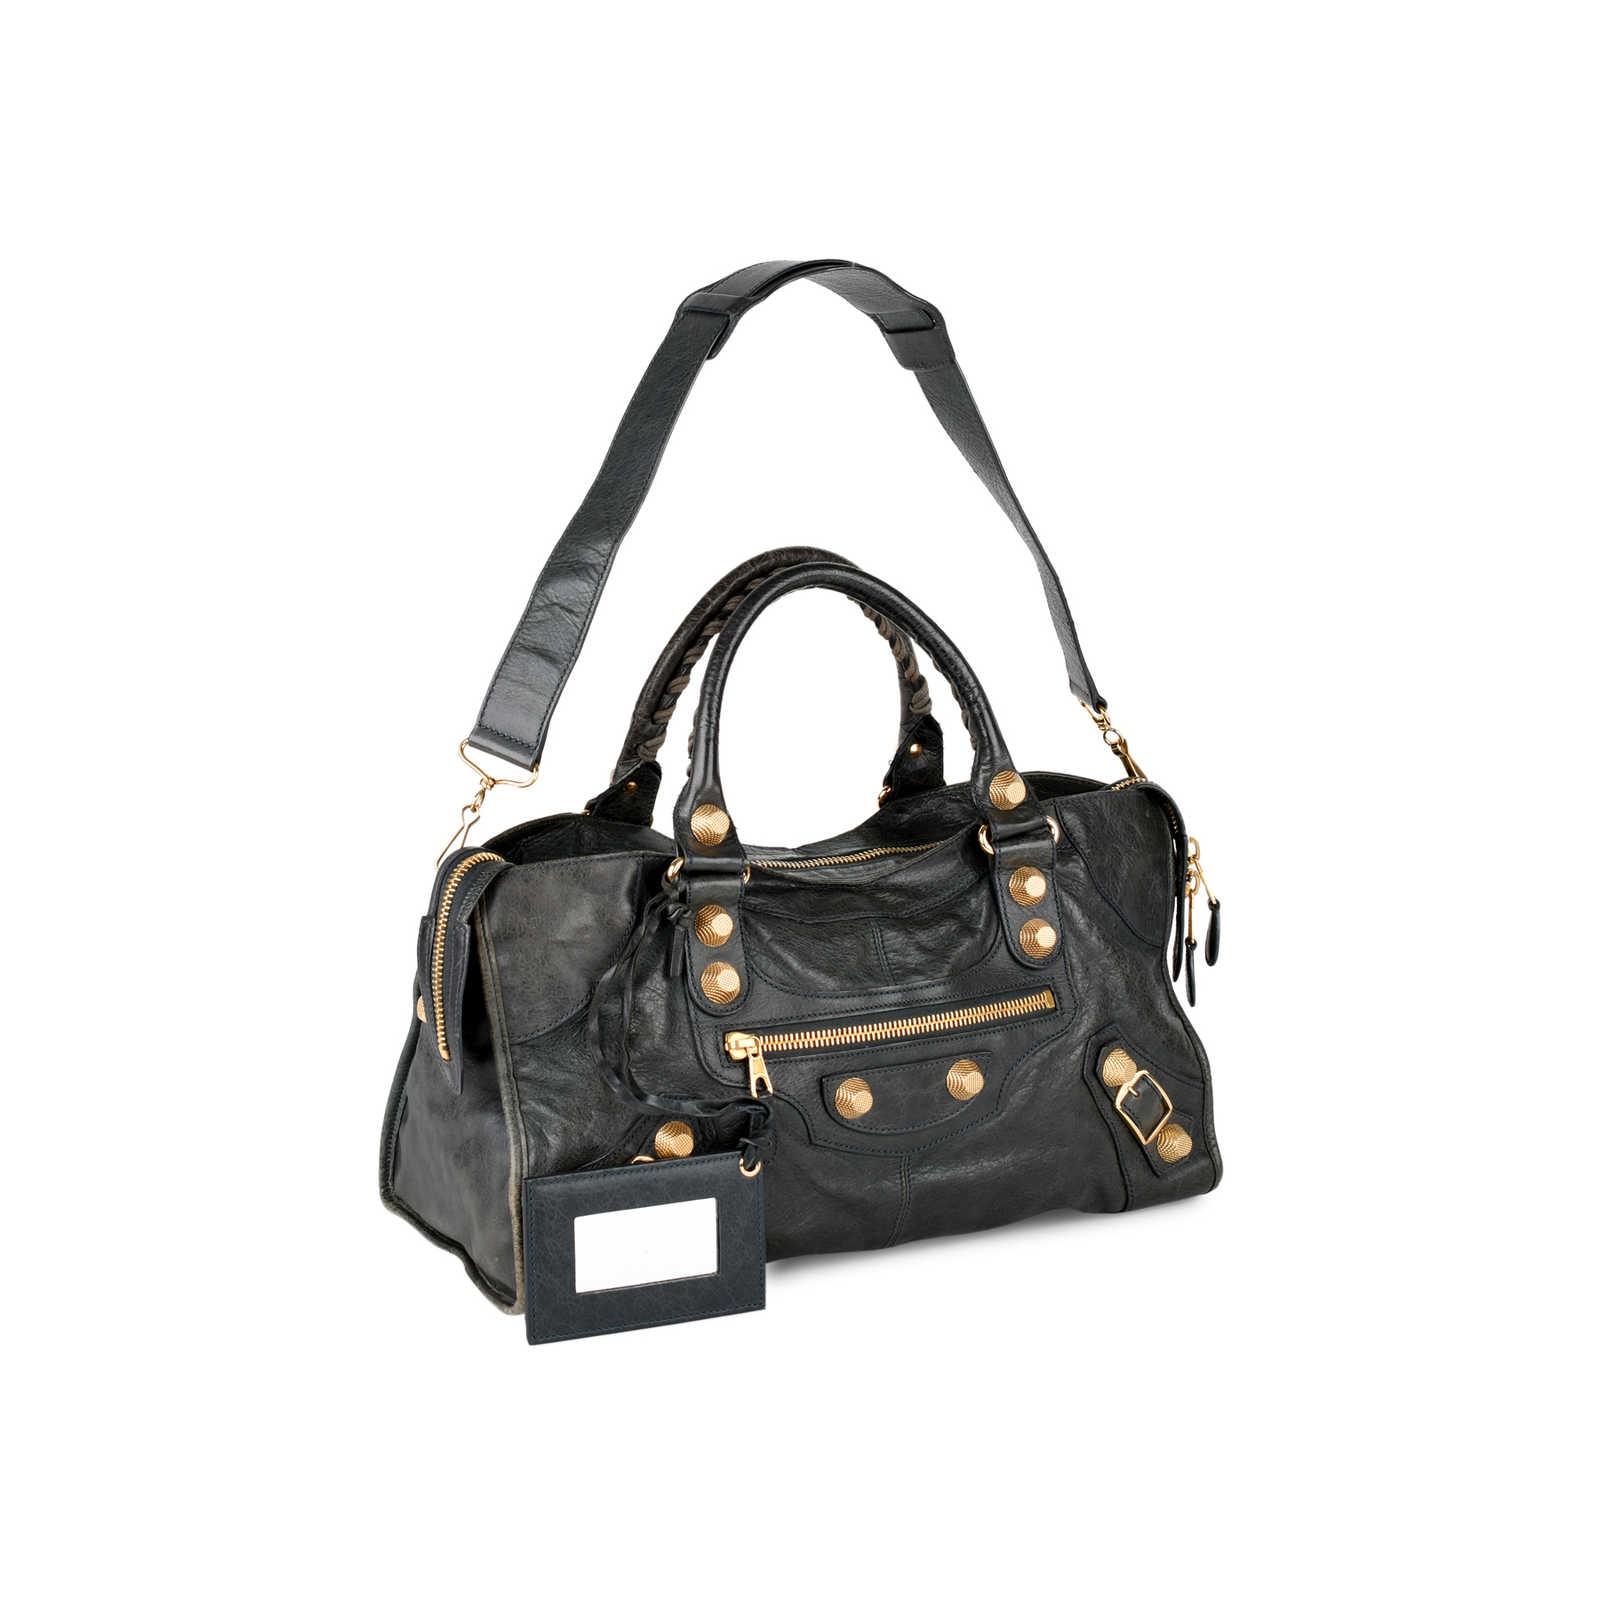 e2b7dbc34d ... Authentic Second Hand Balenciaga Part-Time Giant City Bag  (PSS-439-00004 ...